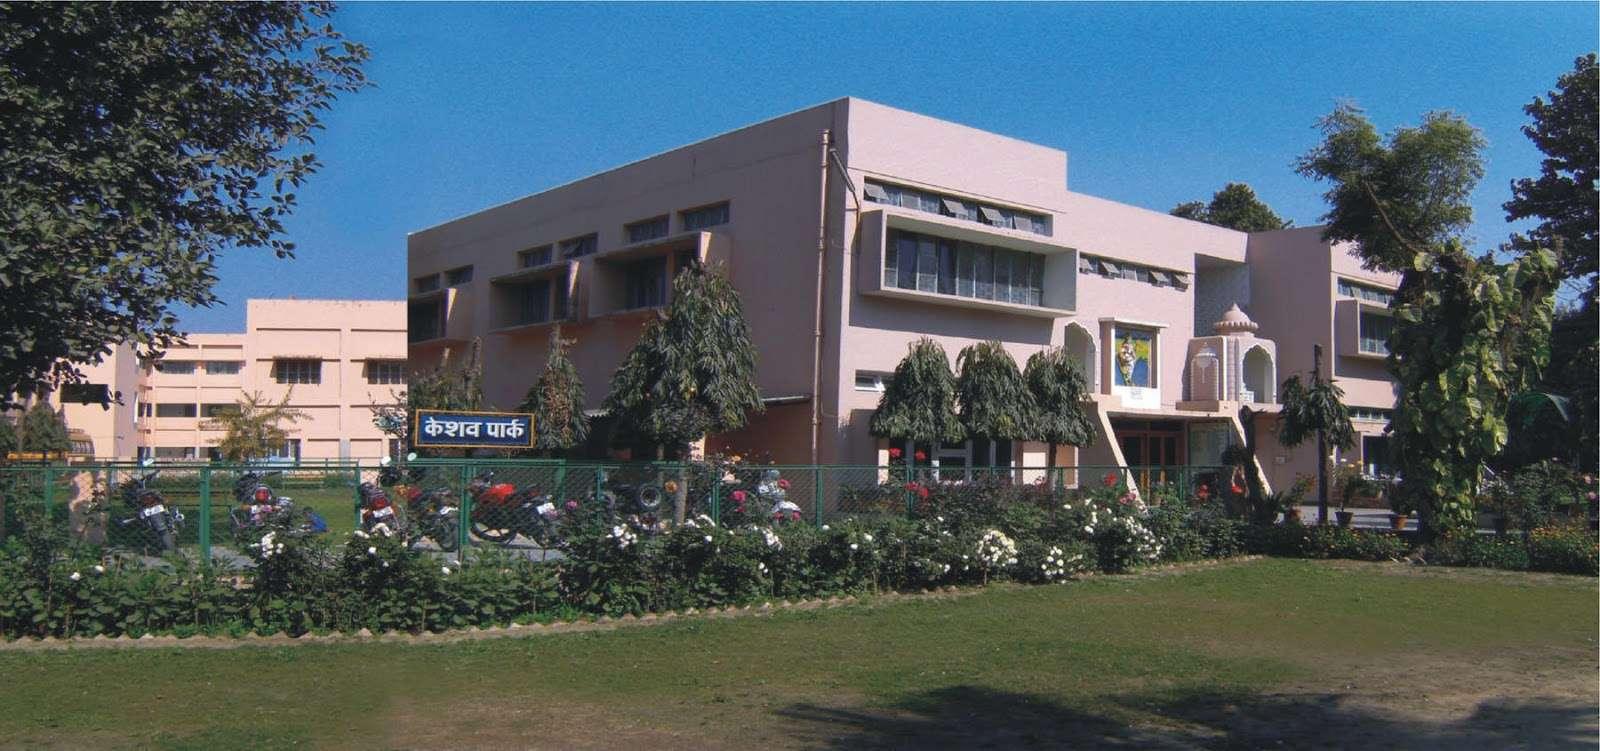 M C L SARASWATI BAL MANDIR L BLOCK HARI NAGAR NEW DELHI 2730055